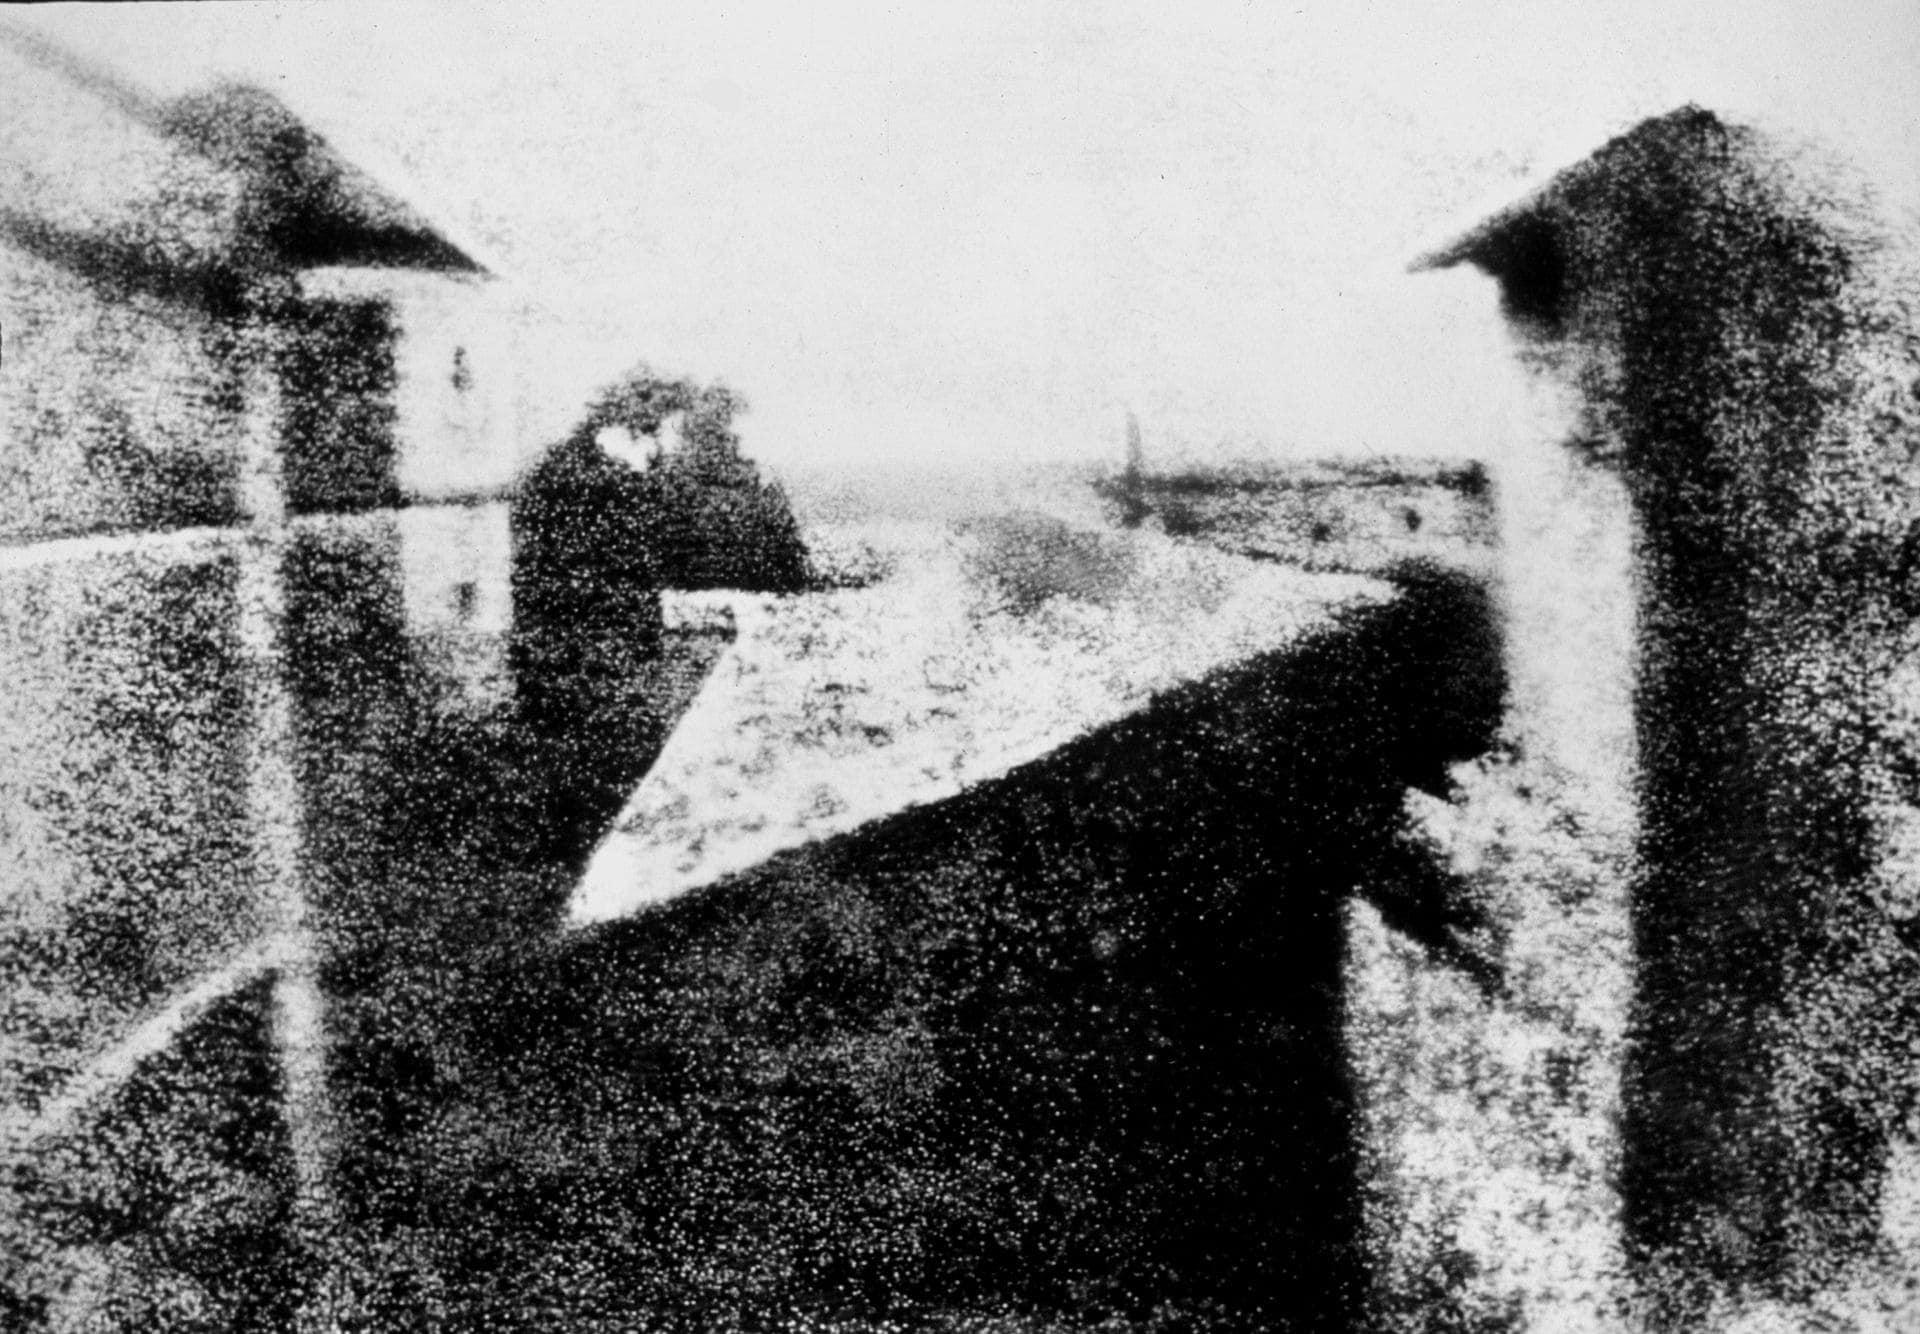 Pohled z okna v Le Gras, Joseph Nicéphore Niépce, 1826 / 1827.